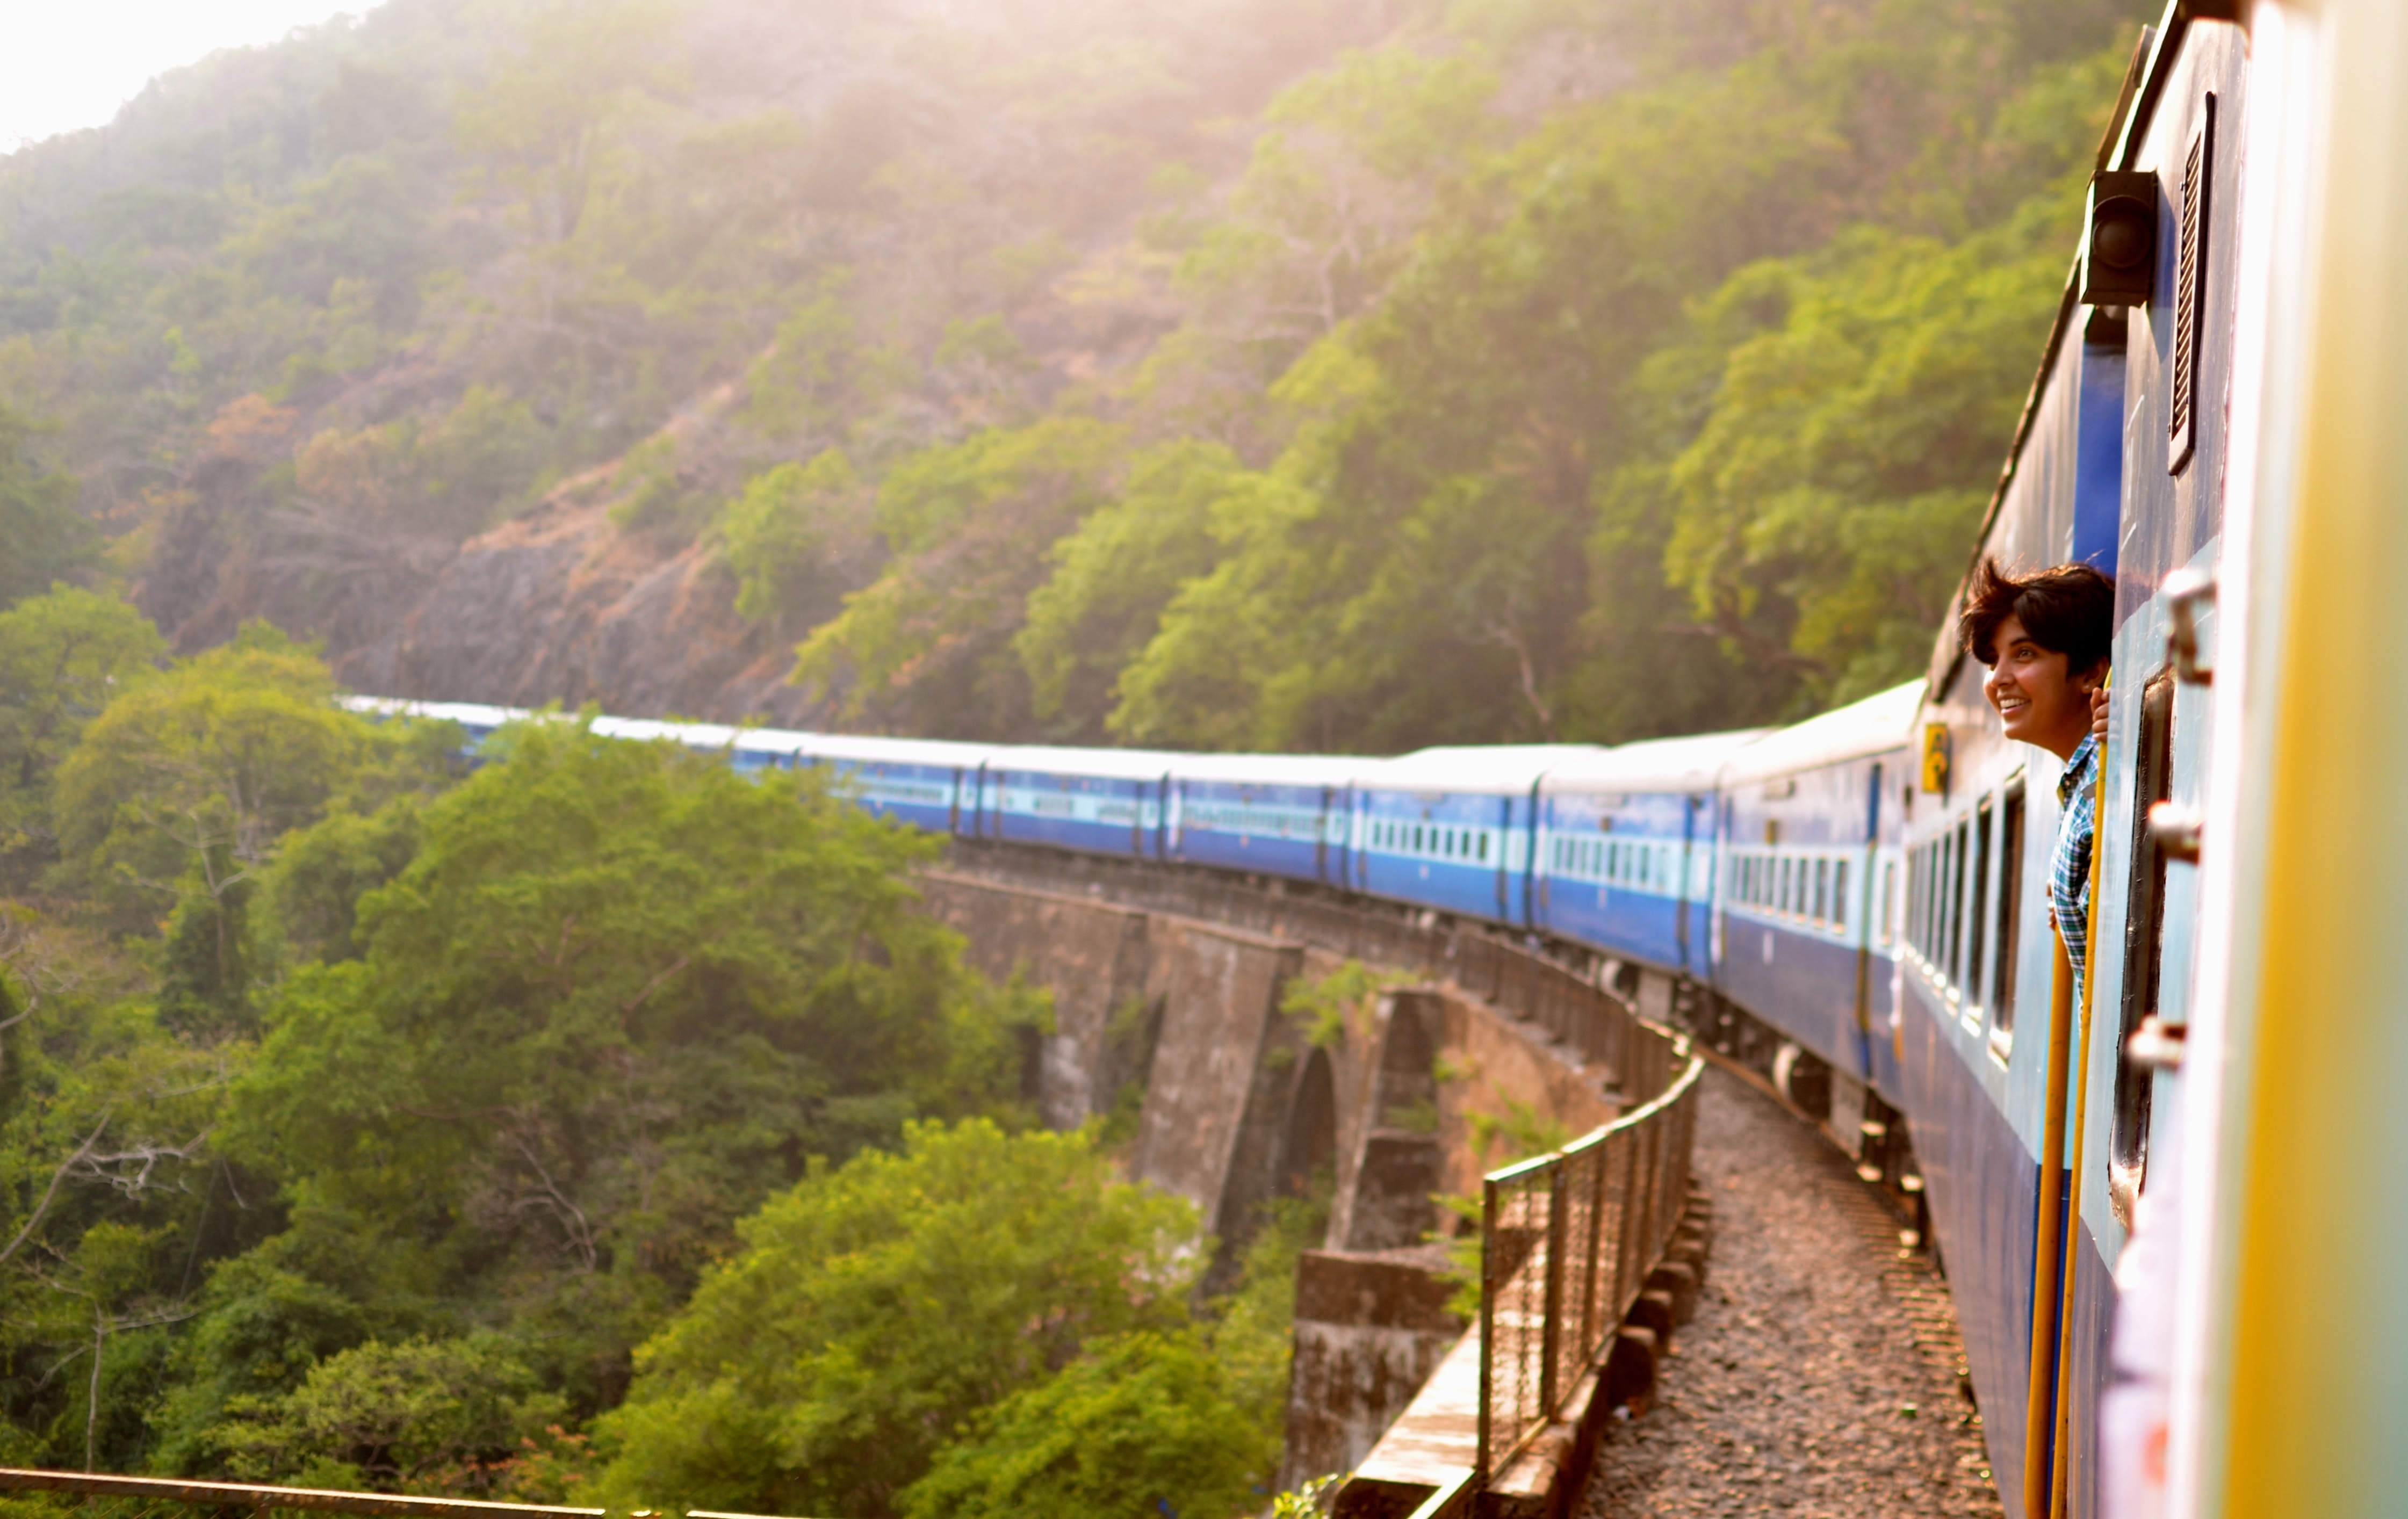 Getting from Mumbai to Kerala